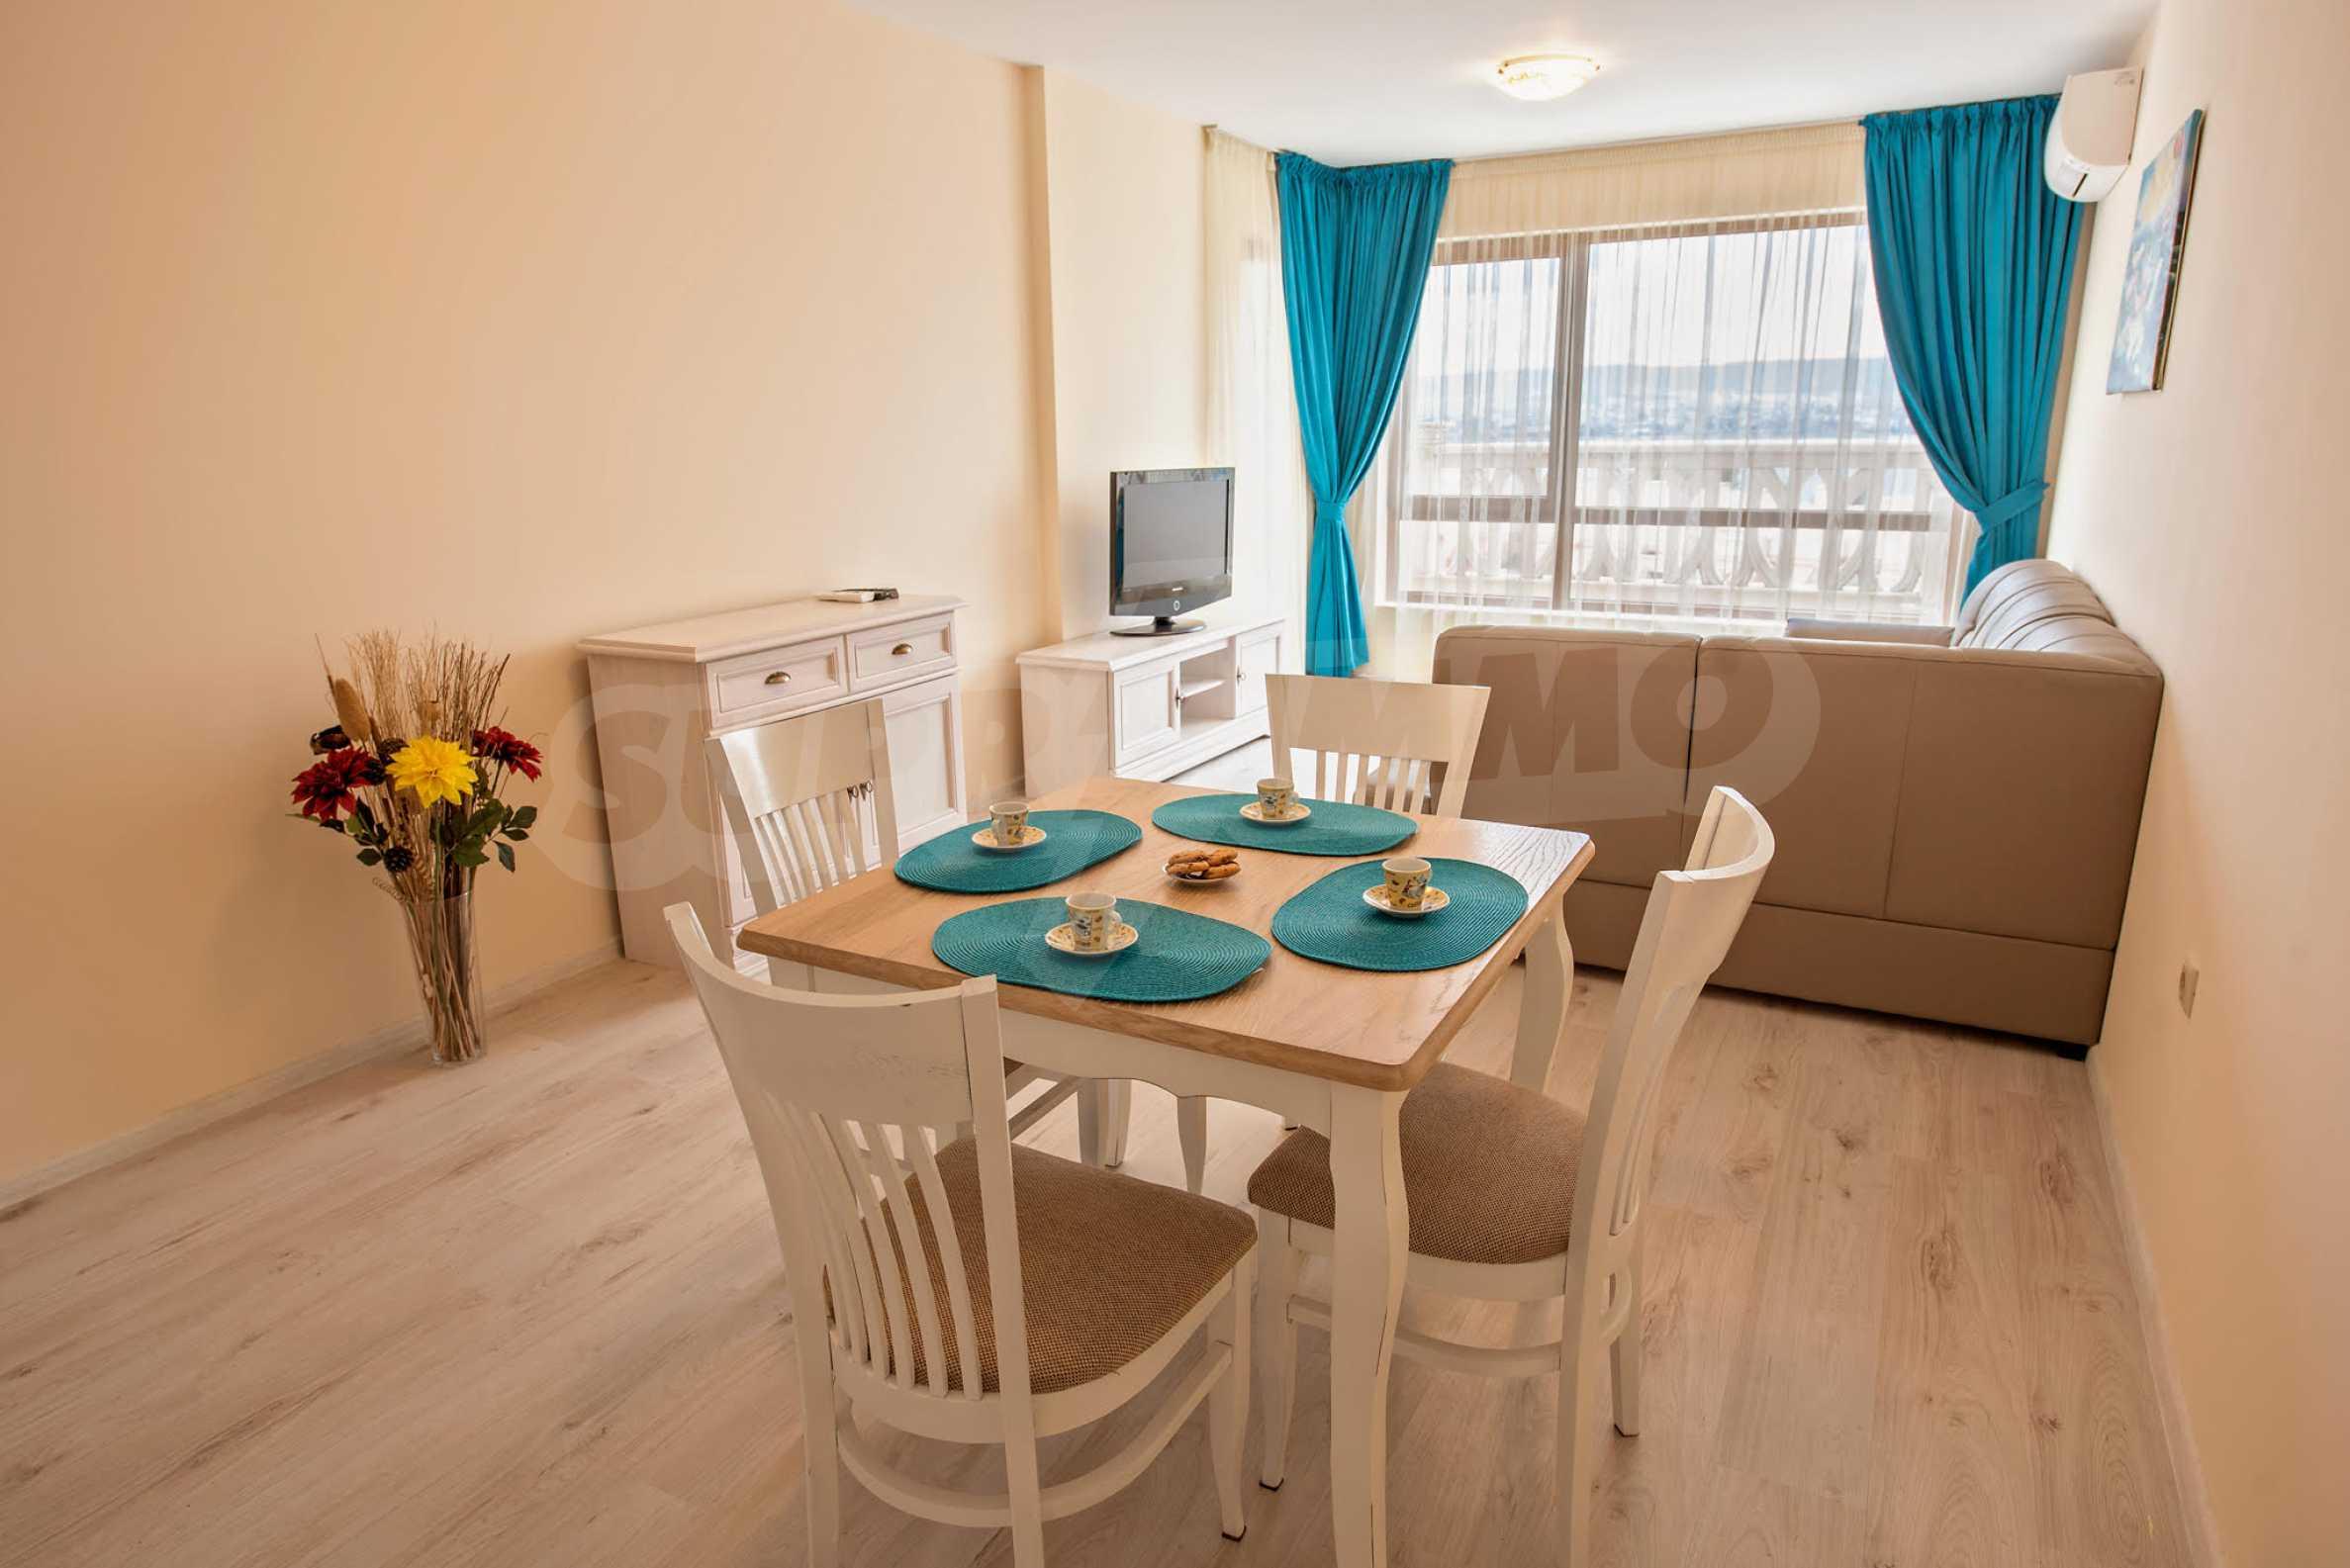 Двустаен апартамент във Варна Саут Бей / Varna South Bay 1